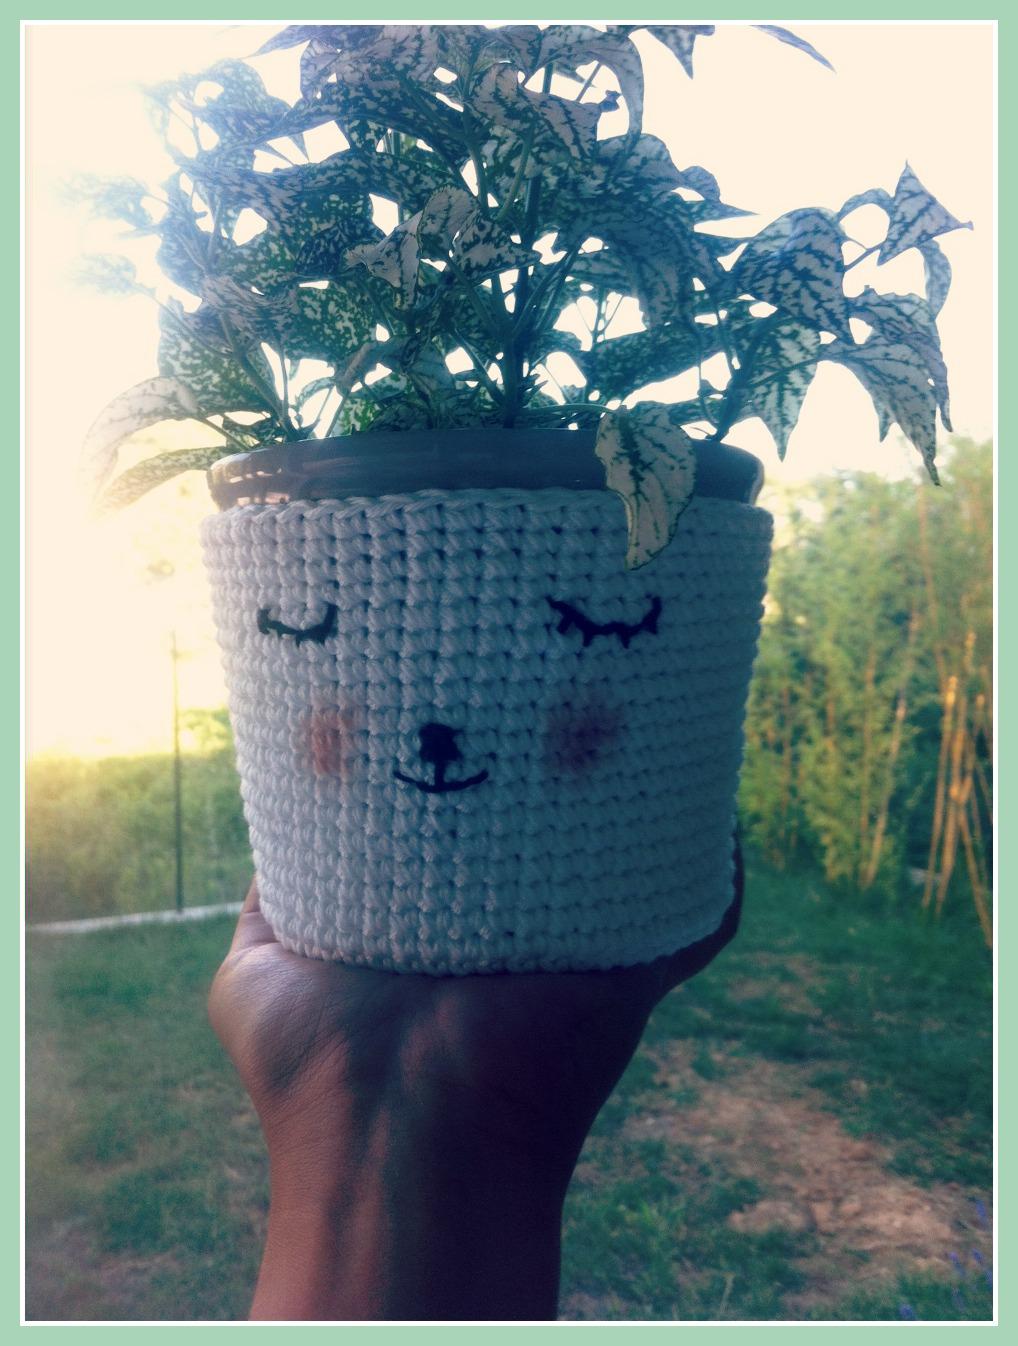 Gut gemocht Tuto crochet : un cche pot trooop mignon EH94